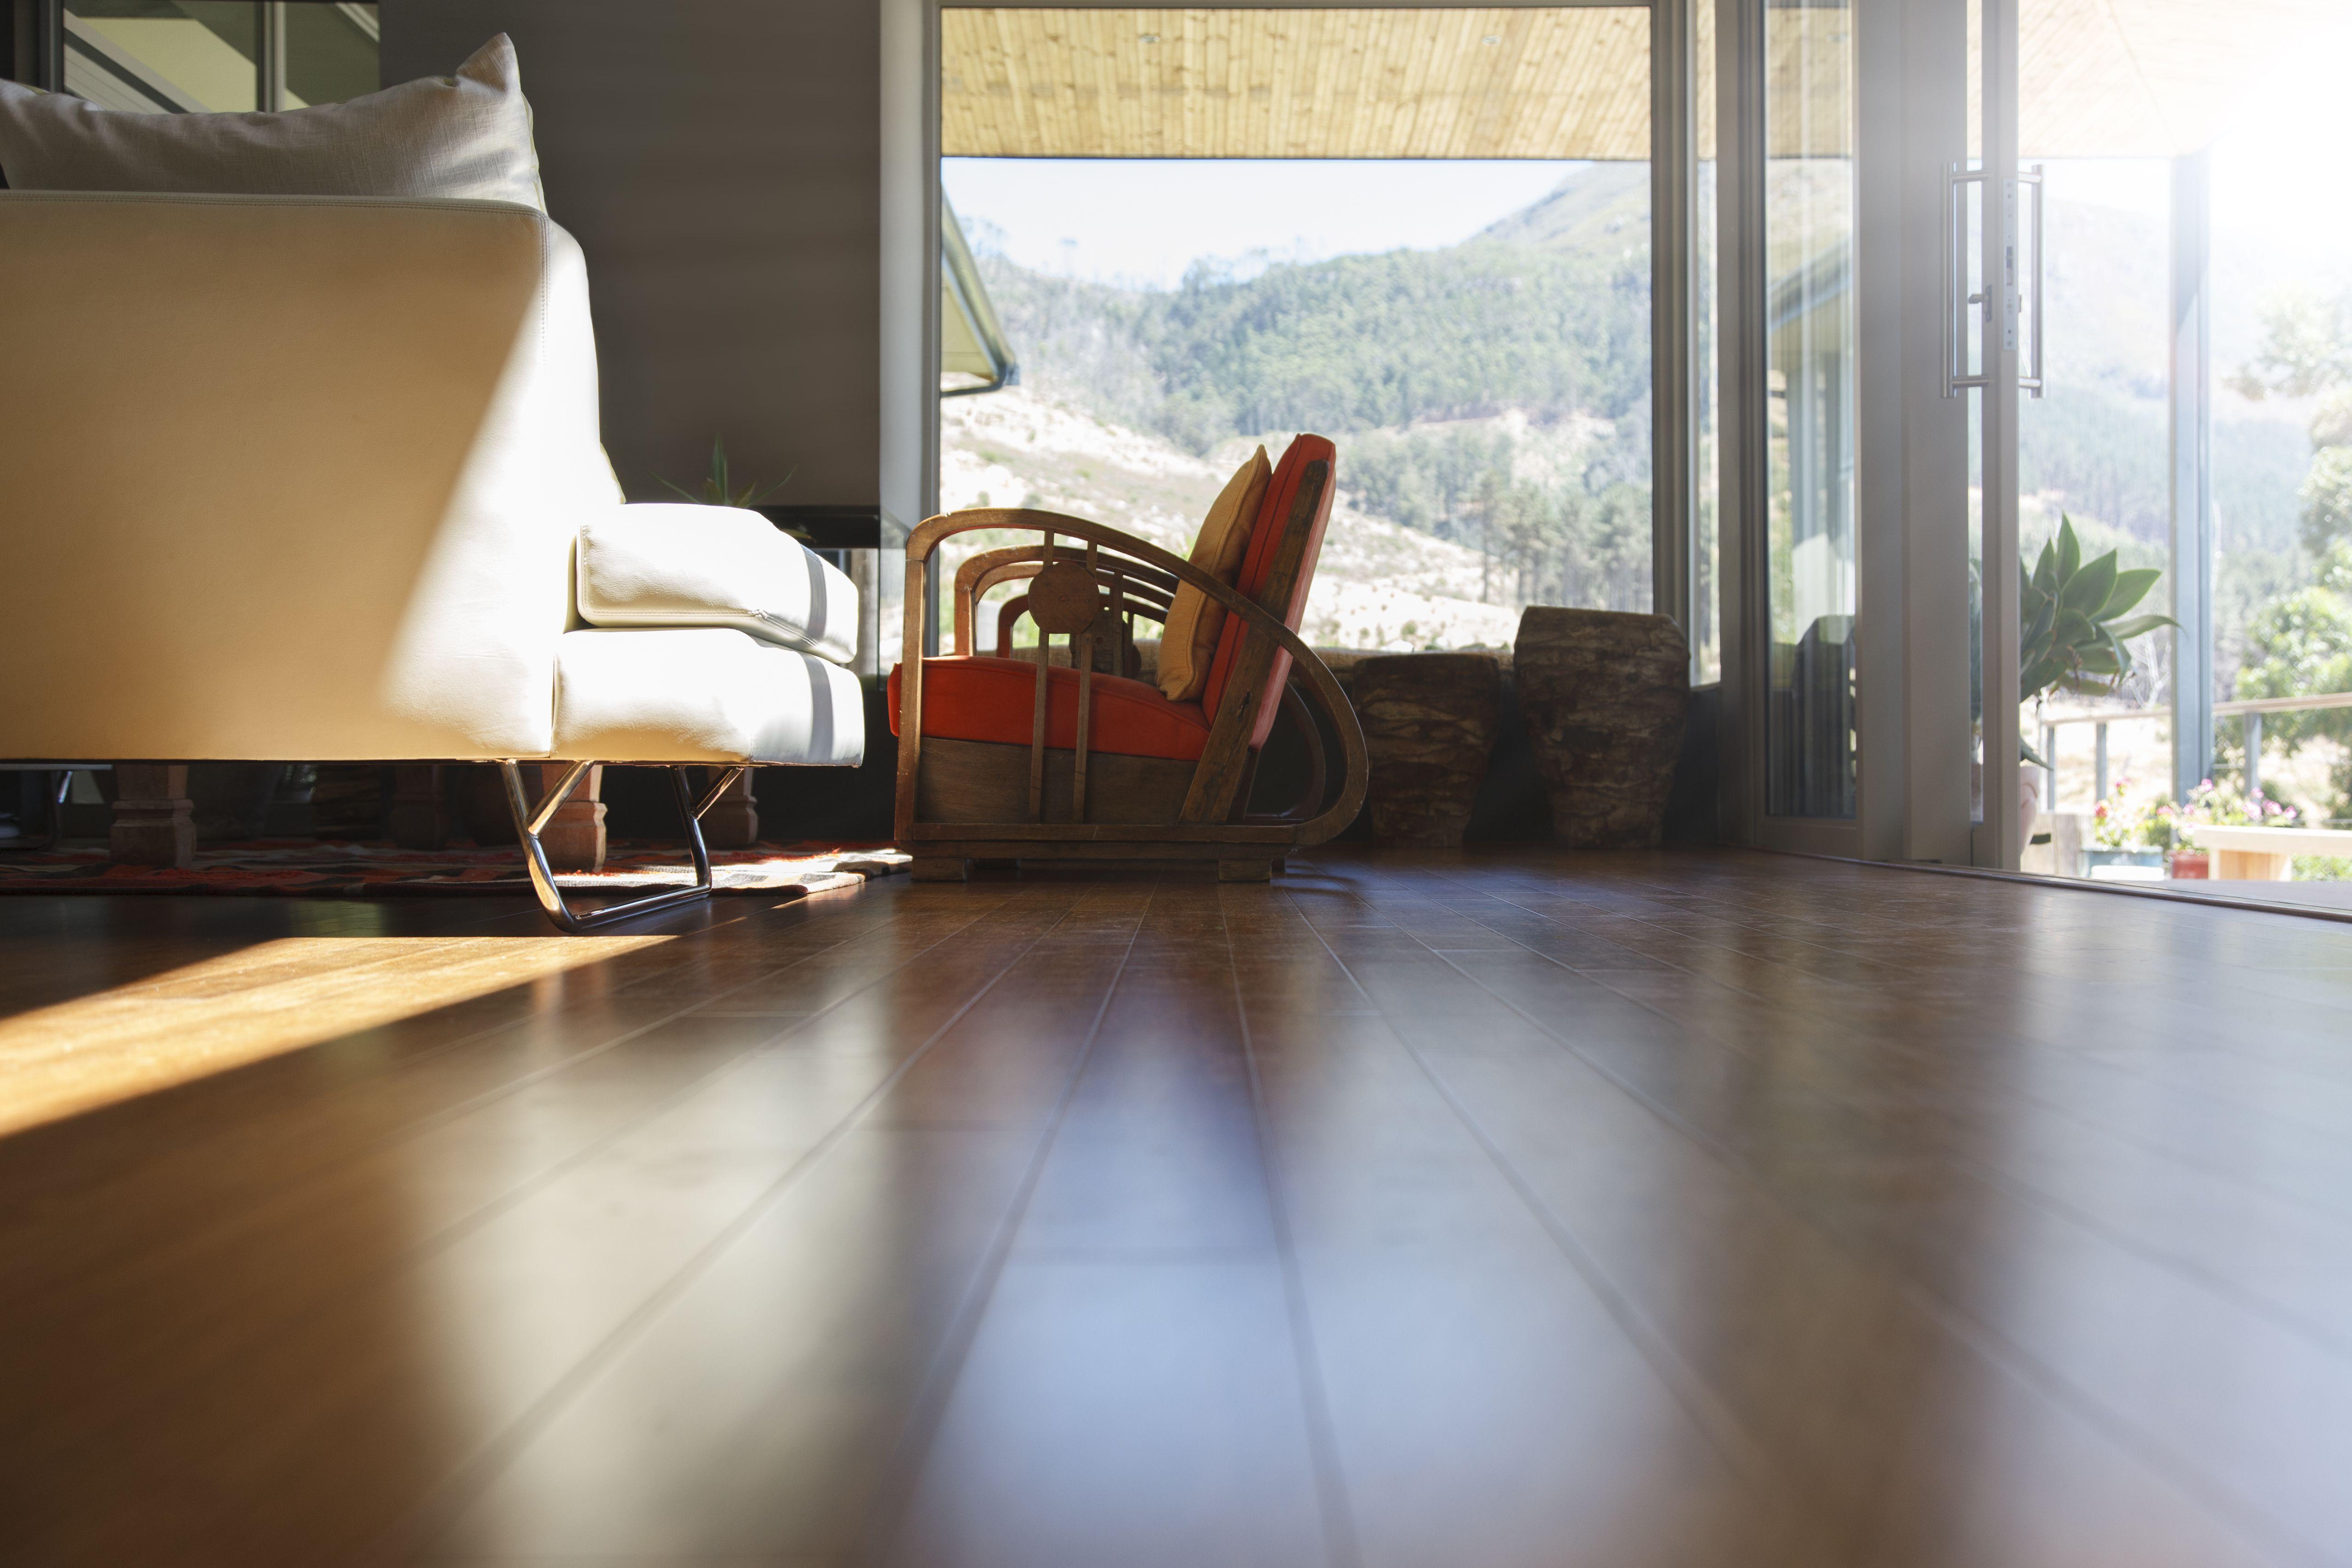 2 1 4 engineered hardwood flooring of types of engineered flooring from premium hardwoods with regard to living room interior hard wood floor and sofa 525439899 5a764f241d64040037603c15